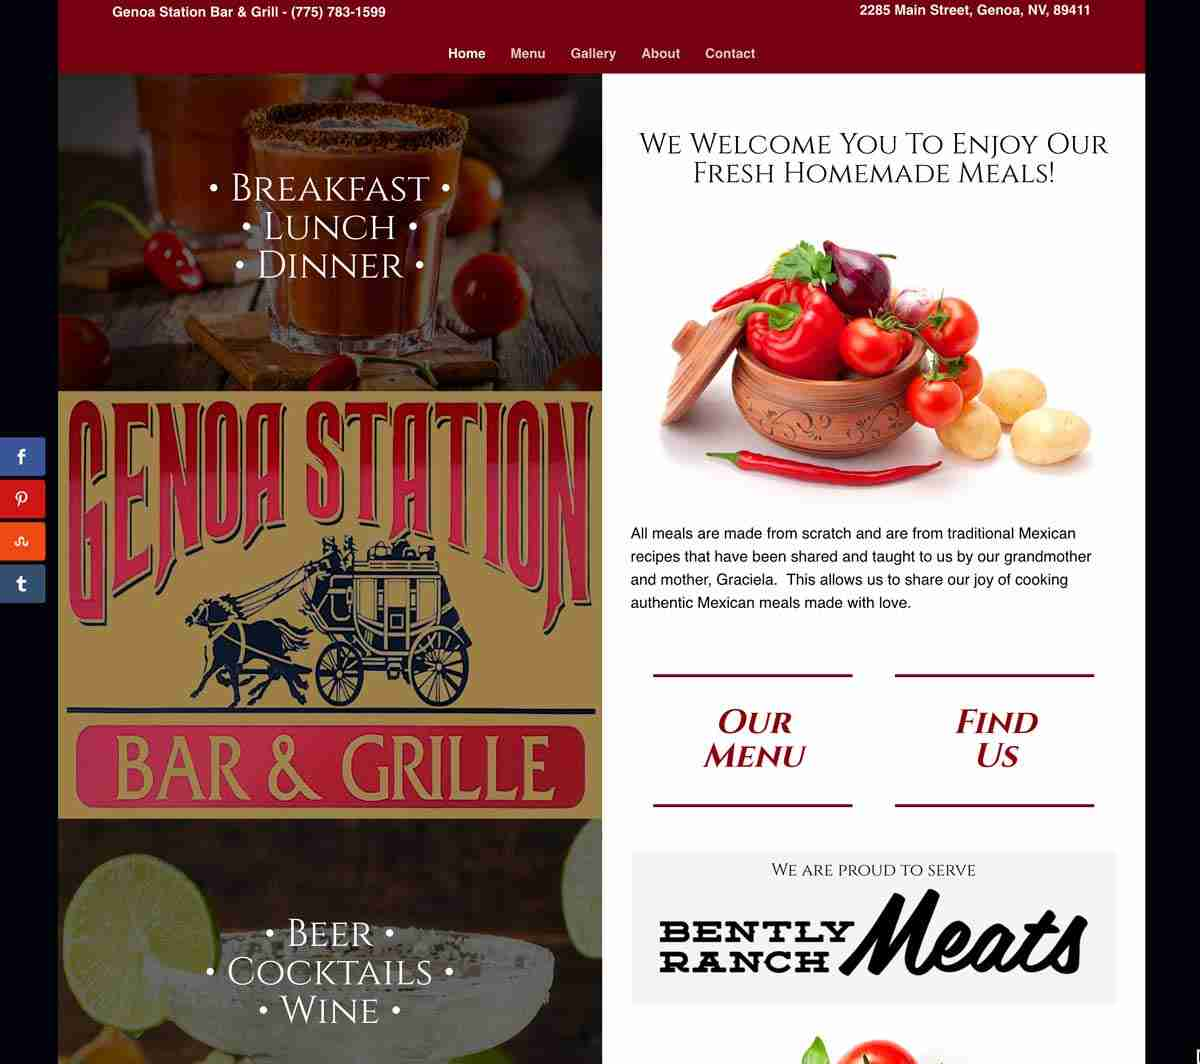 Genoa Station Bar & Grill Website by Internovations